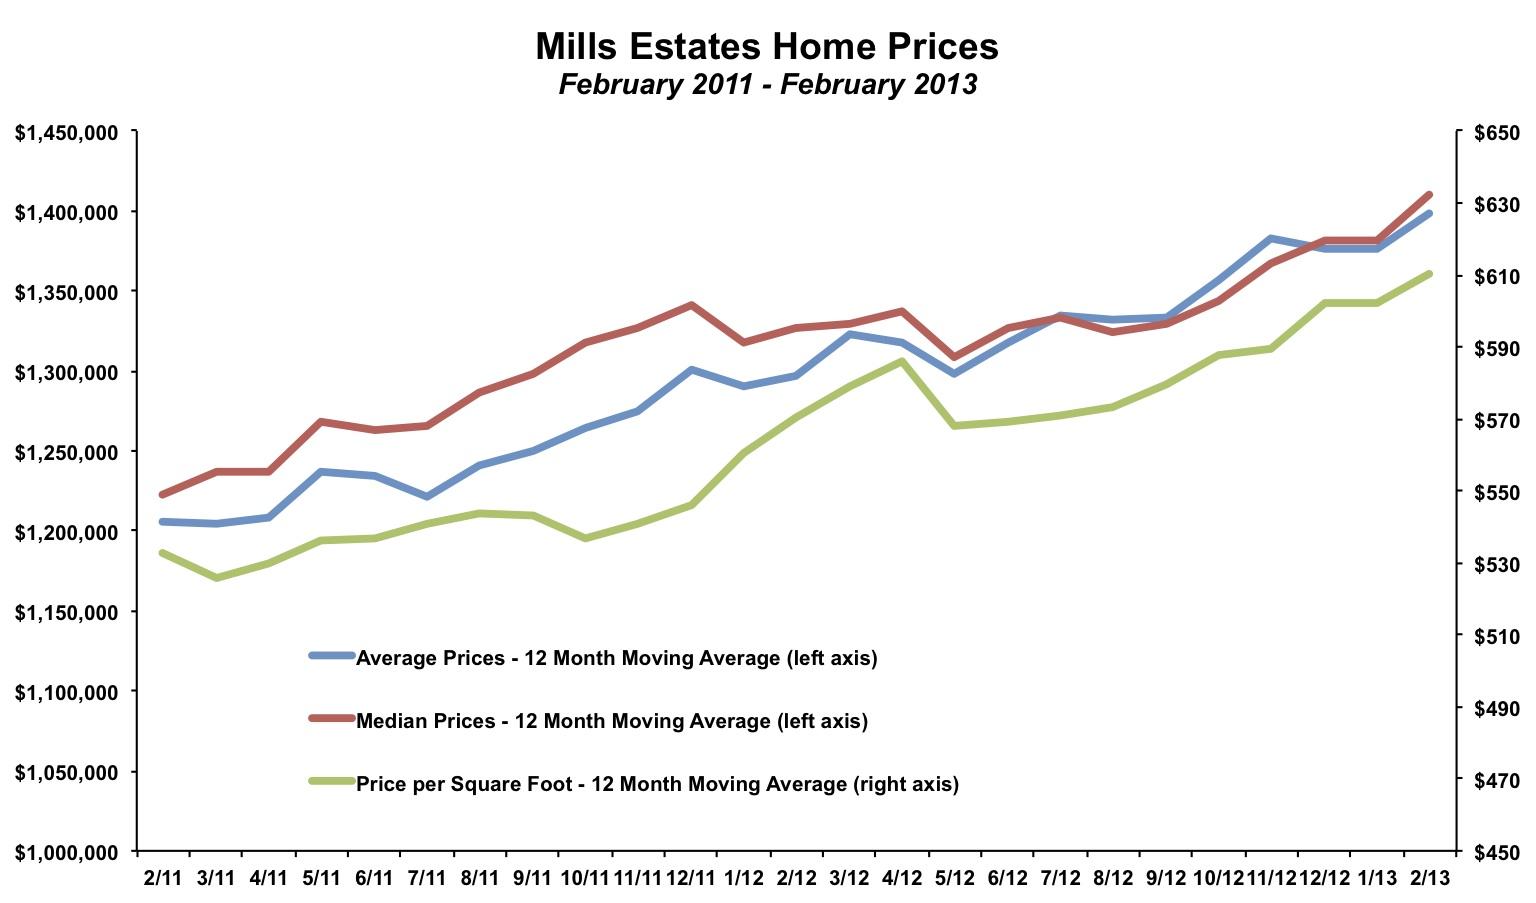 Mills Estates Home Prices February 2013